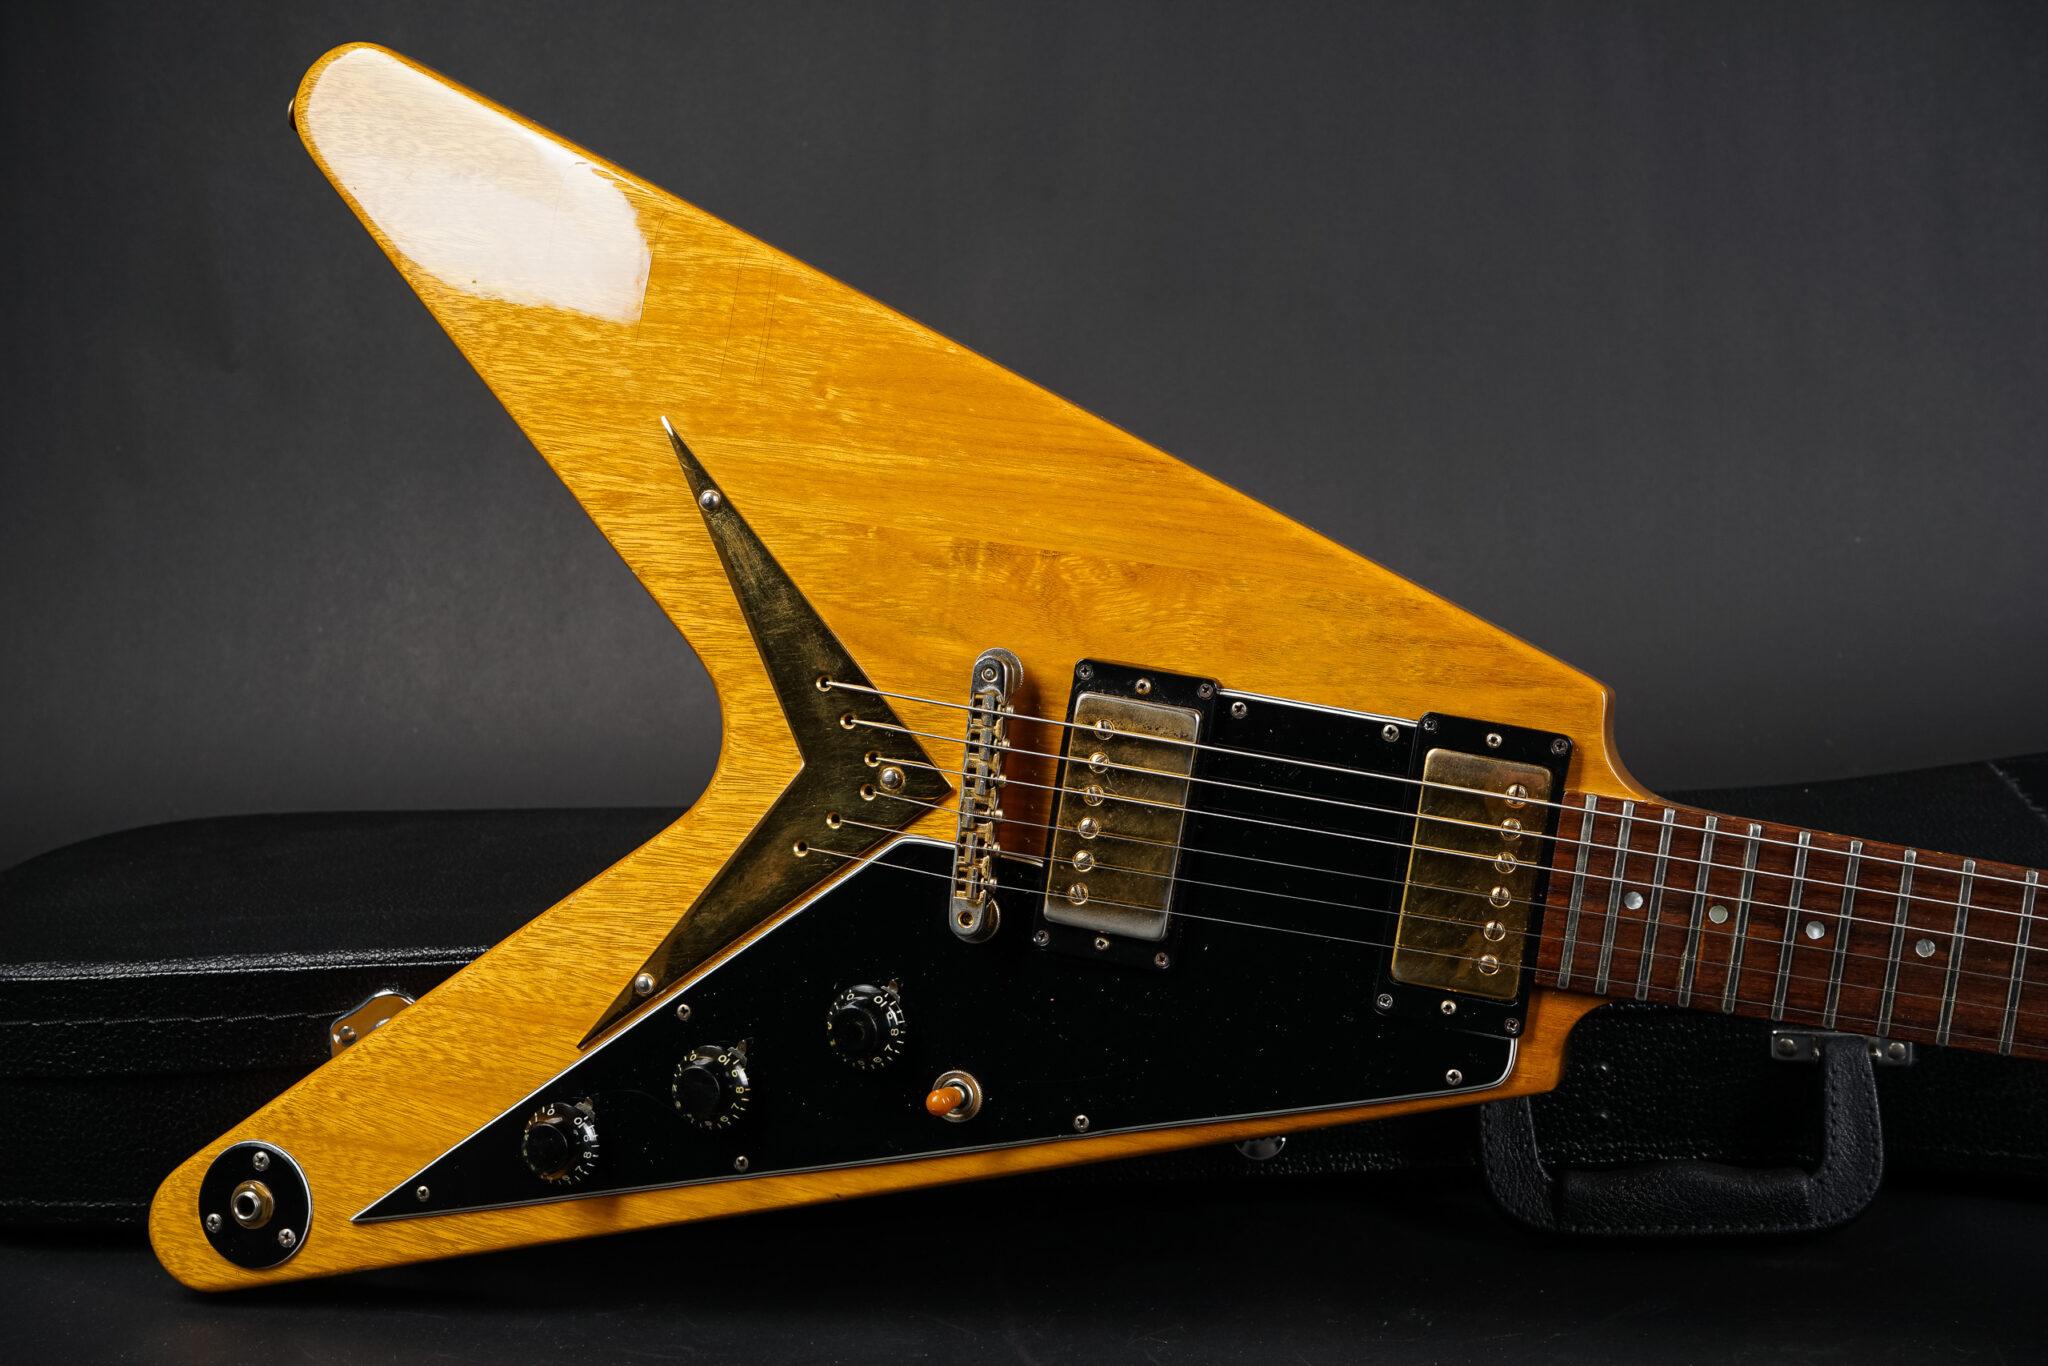 https://guitarpoint.de/app/uploads/products/1982-gibson-flying-v-heritage-korina-natural/1982-Gibson-Heritage-Flying-V-Korina-C011-9-2048x1366.jpg